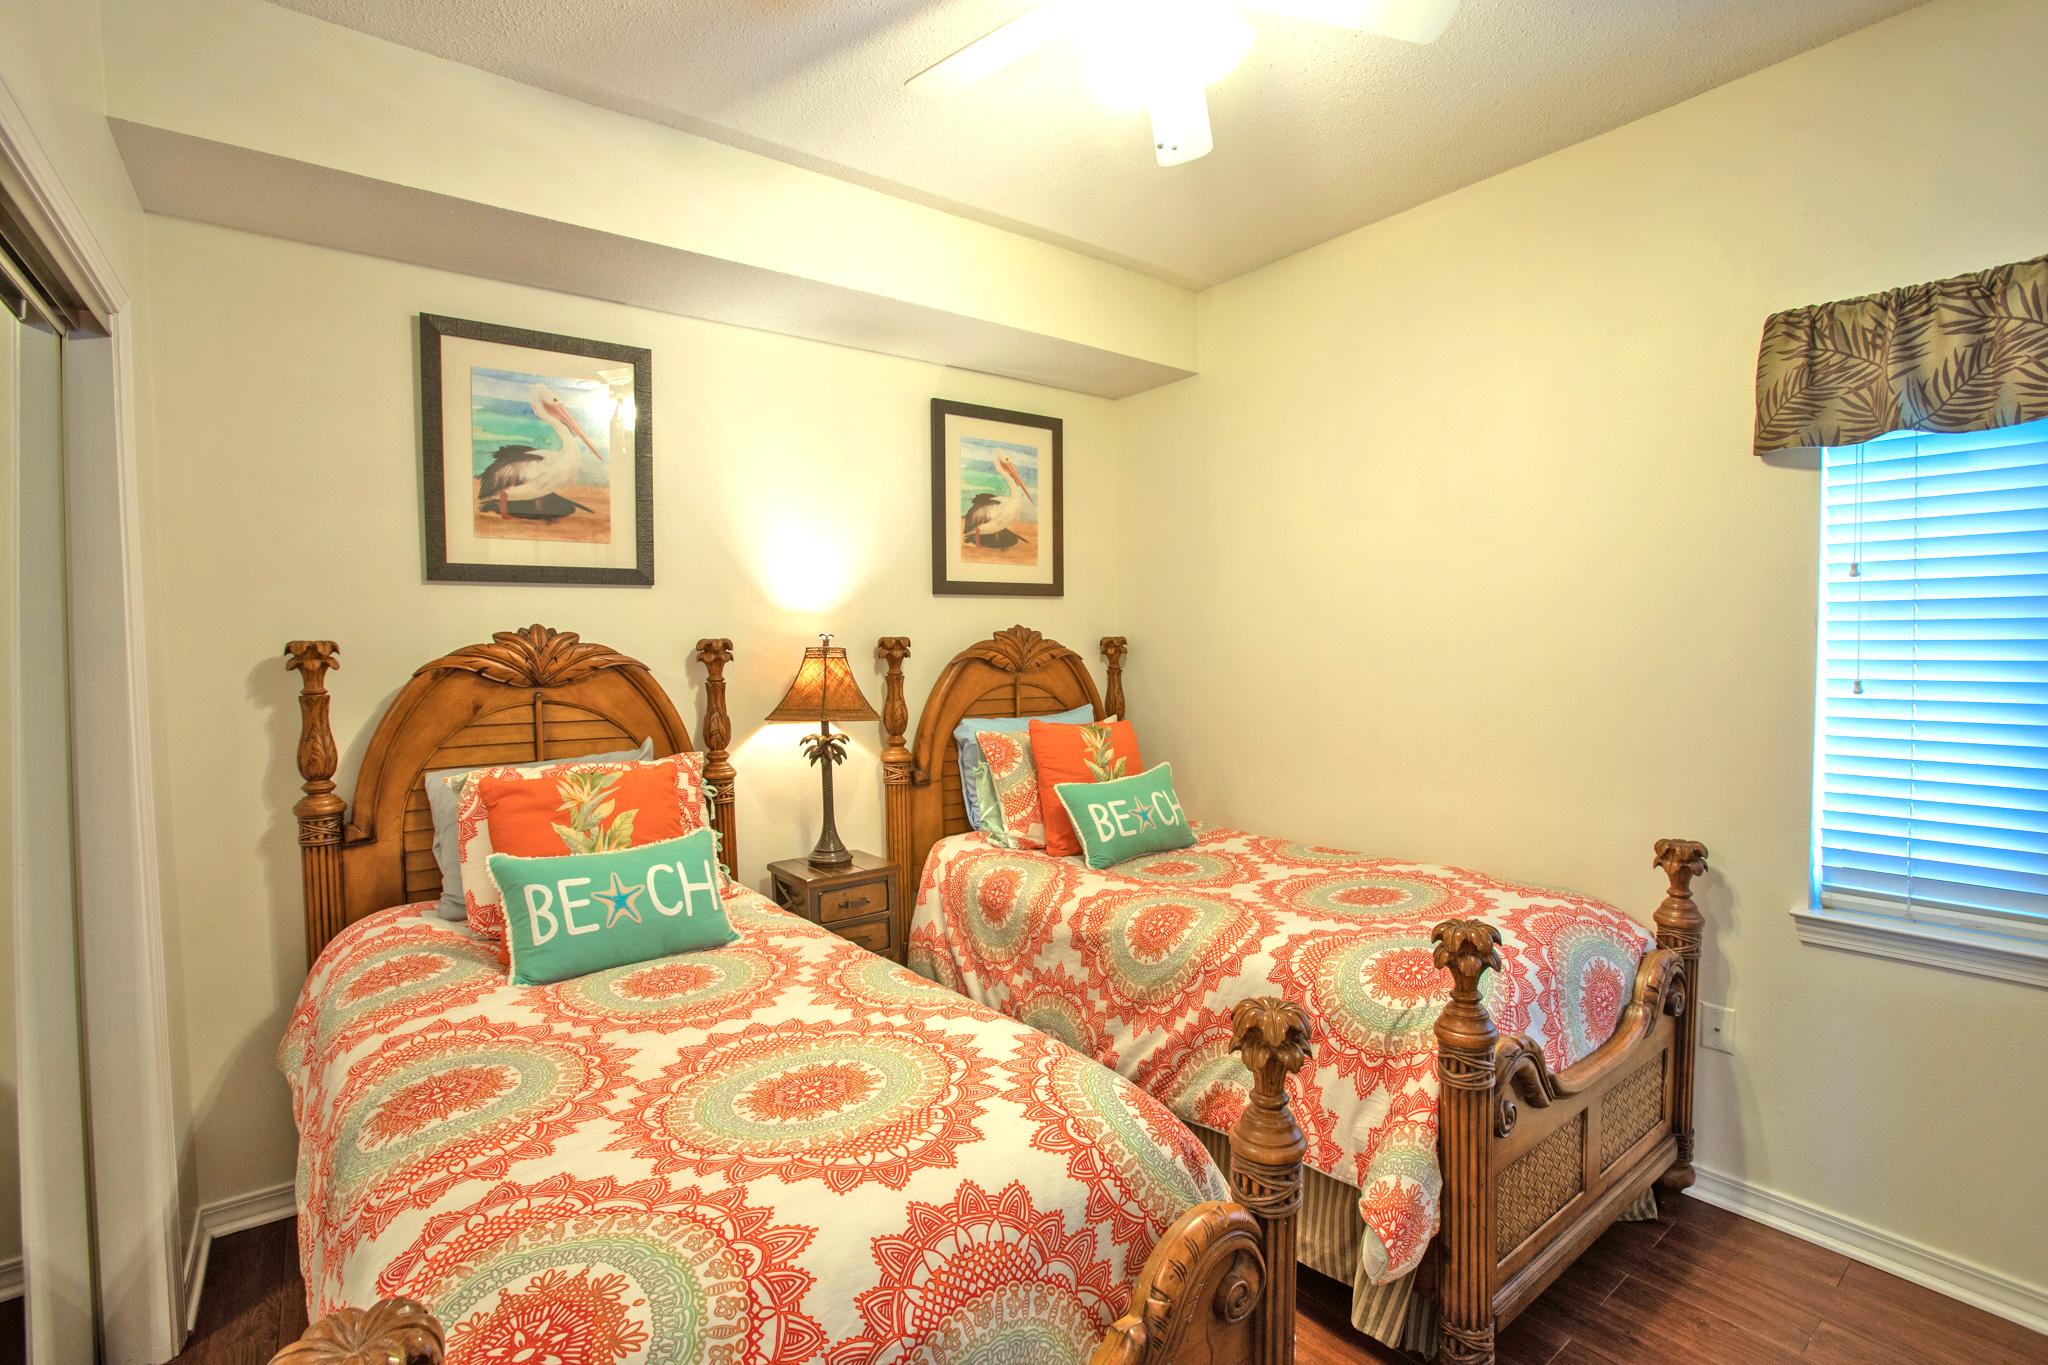 South Harbour #7E Condo rental in South Harbour ~ Pensacola Beach Vacation Rentals by BeachGuide in Pensacola Beach Florida - #3